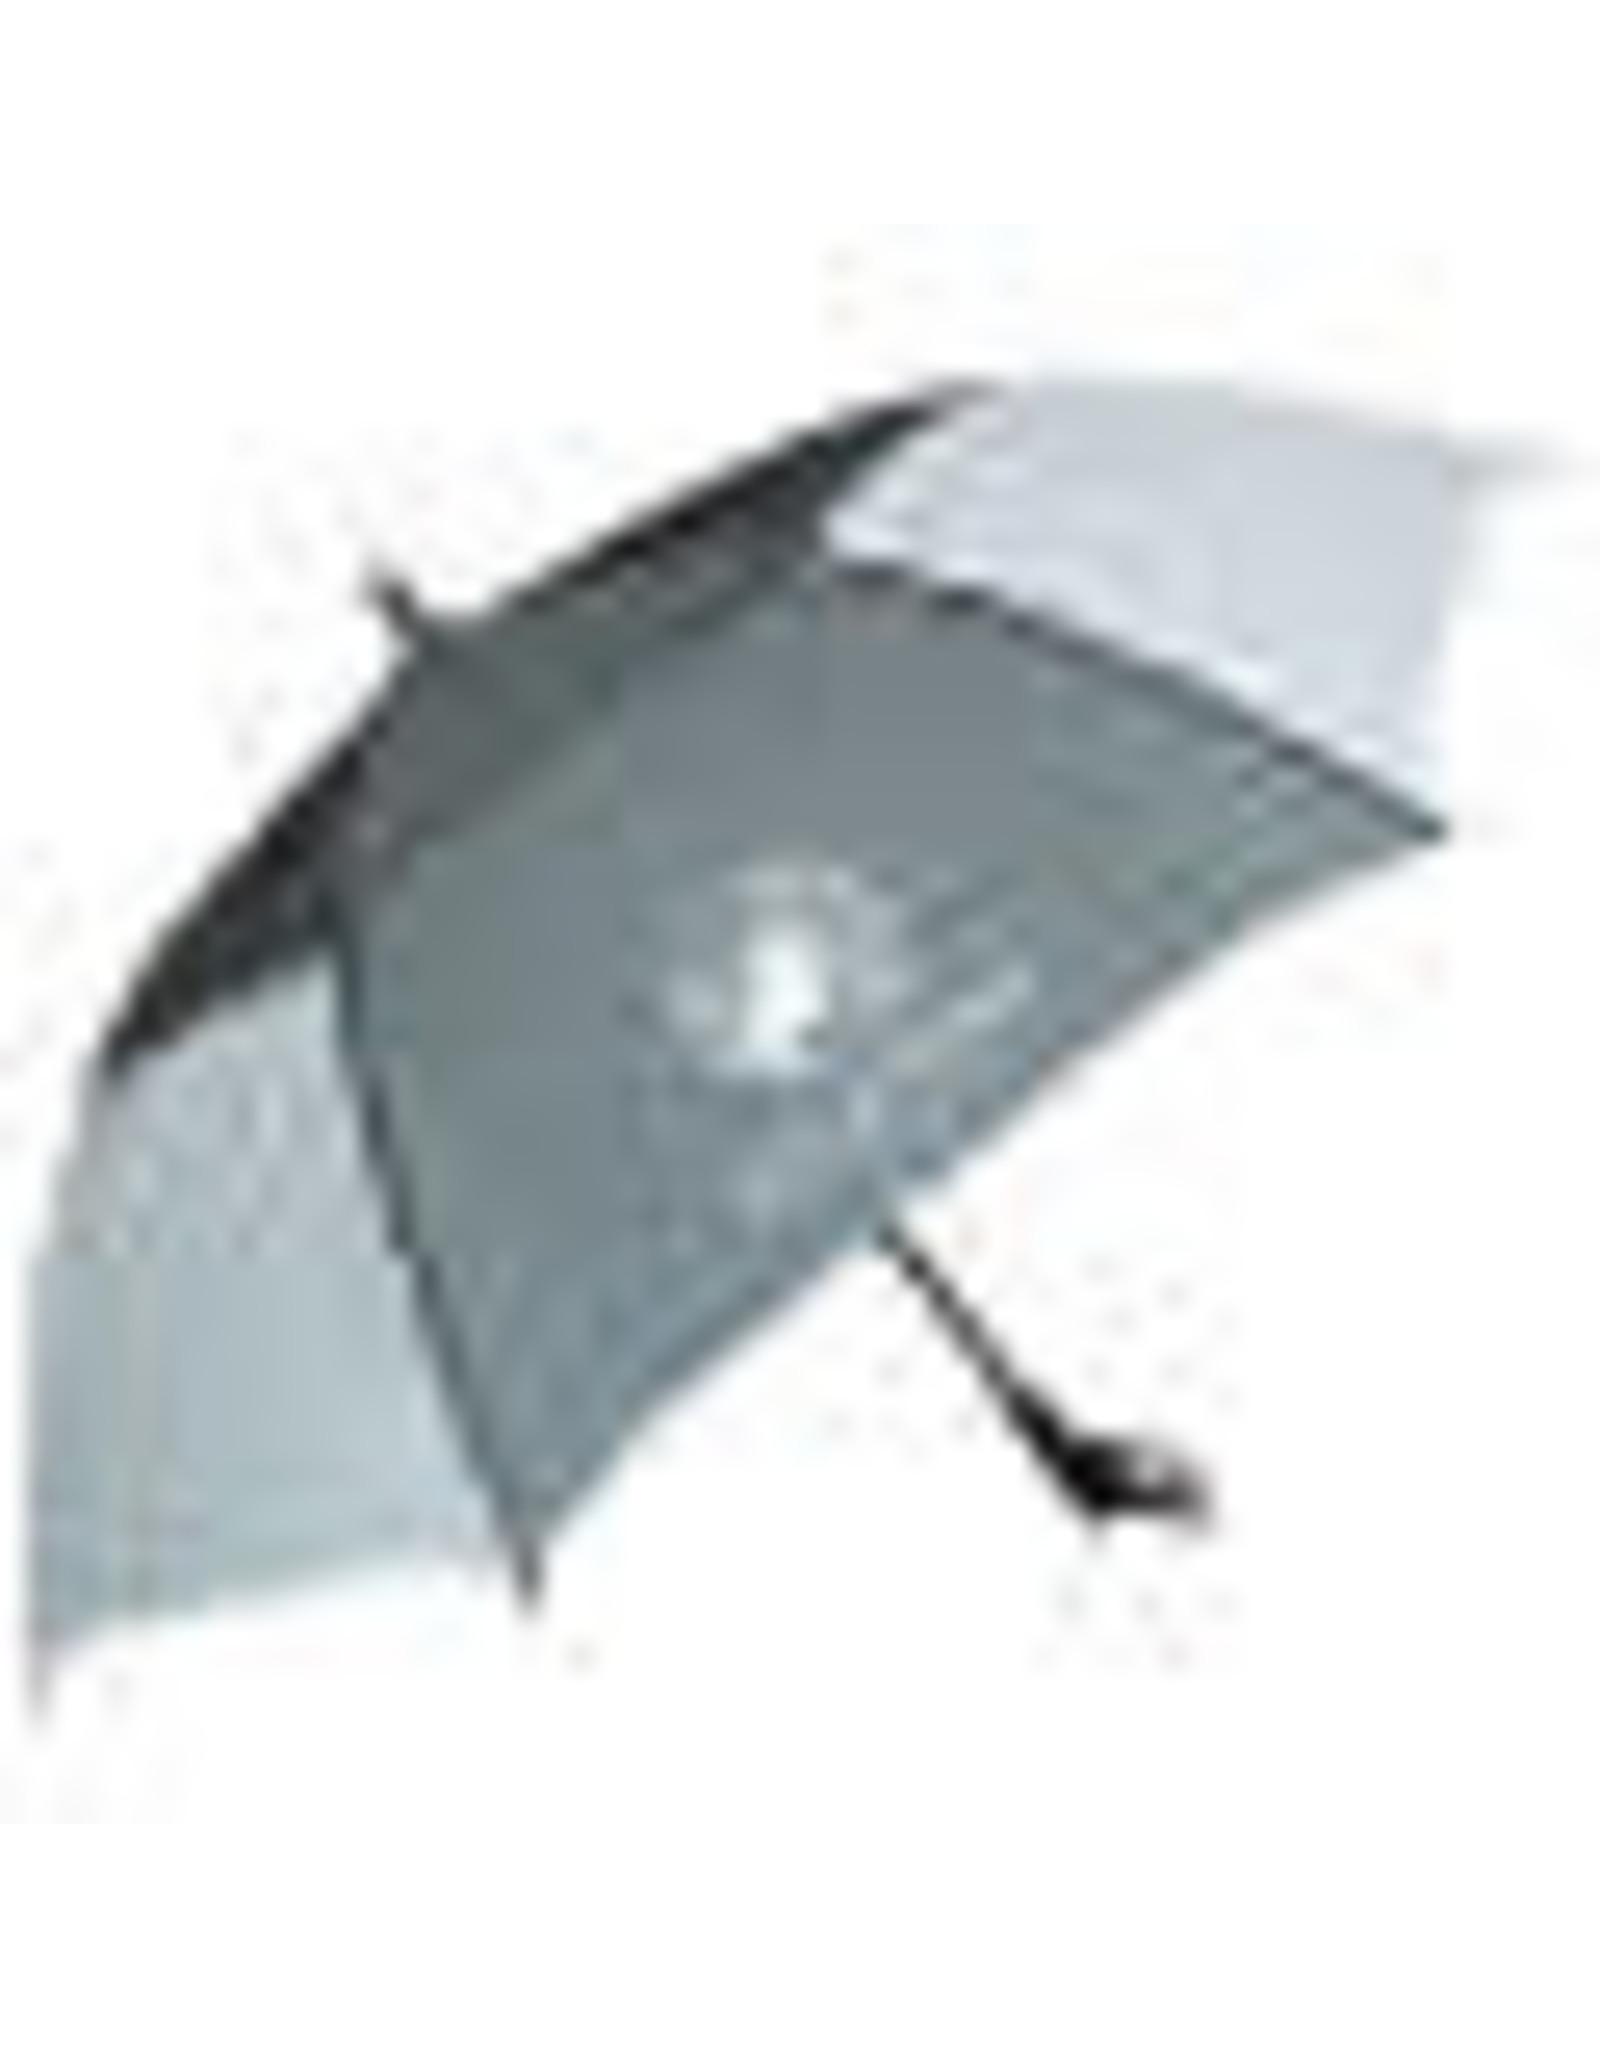 BEACHCOMBER Beachcomber Golf Umbrella